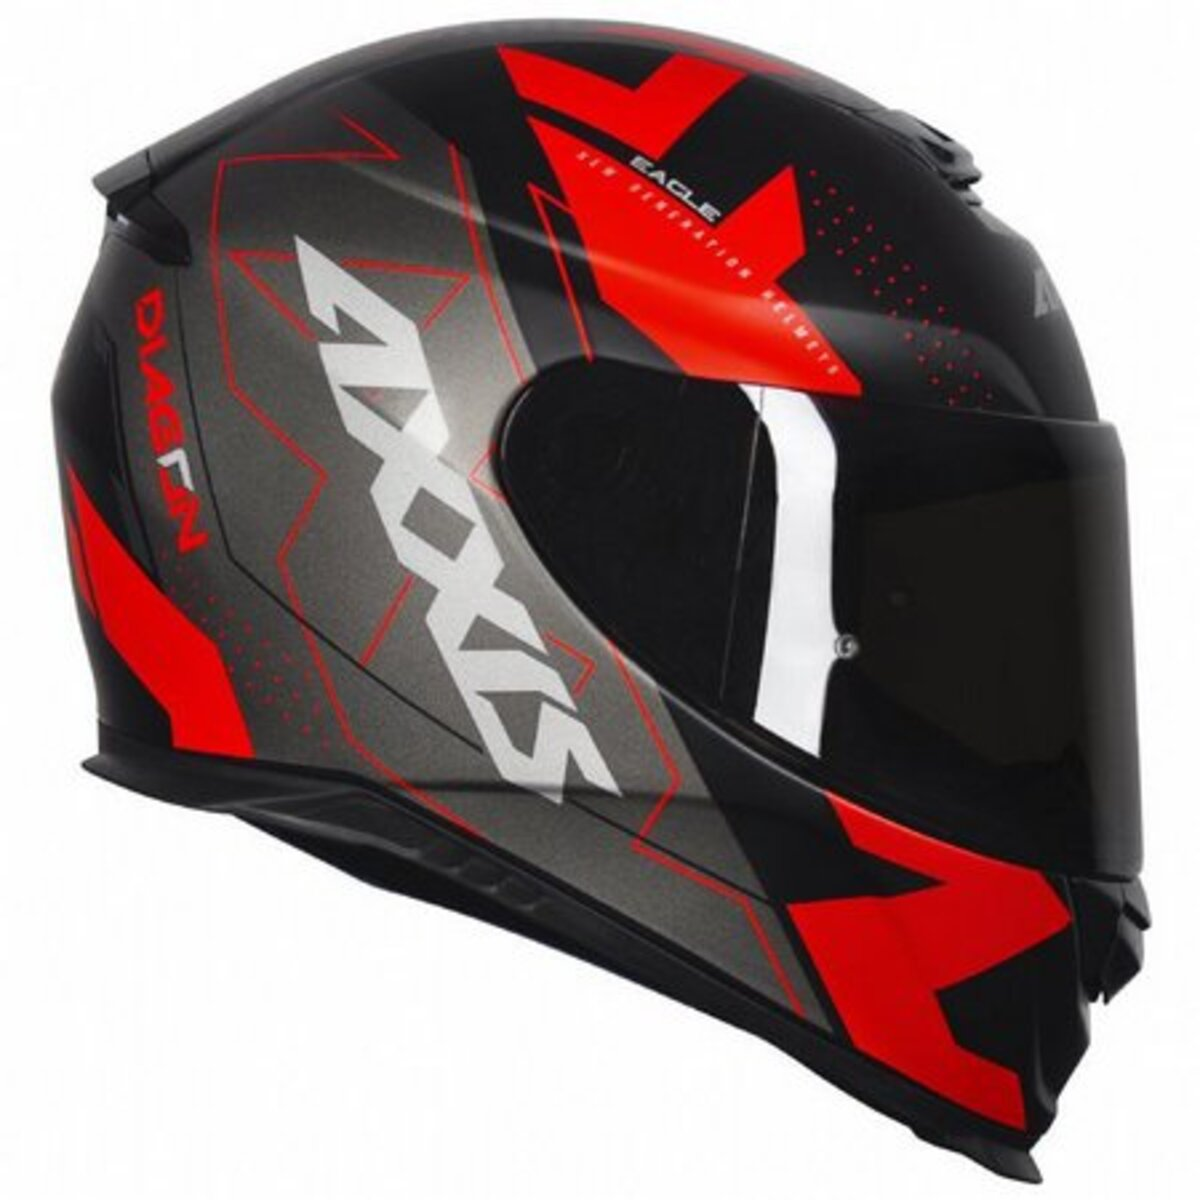 CAPACETE AXXIS EAGLE DIAGON MATTE BLACK/RED 62/XL